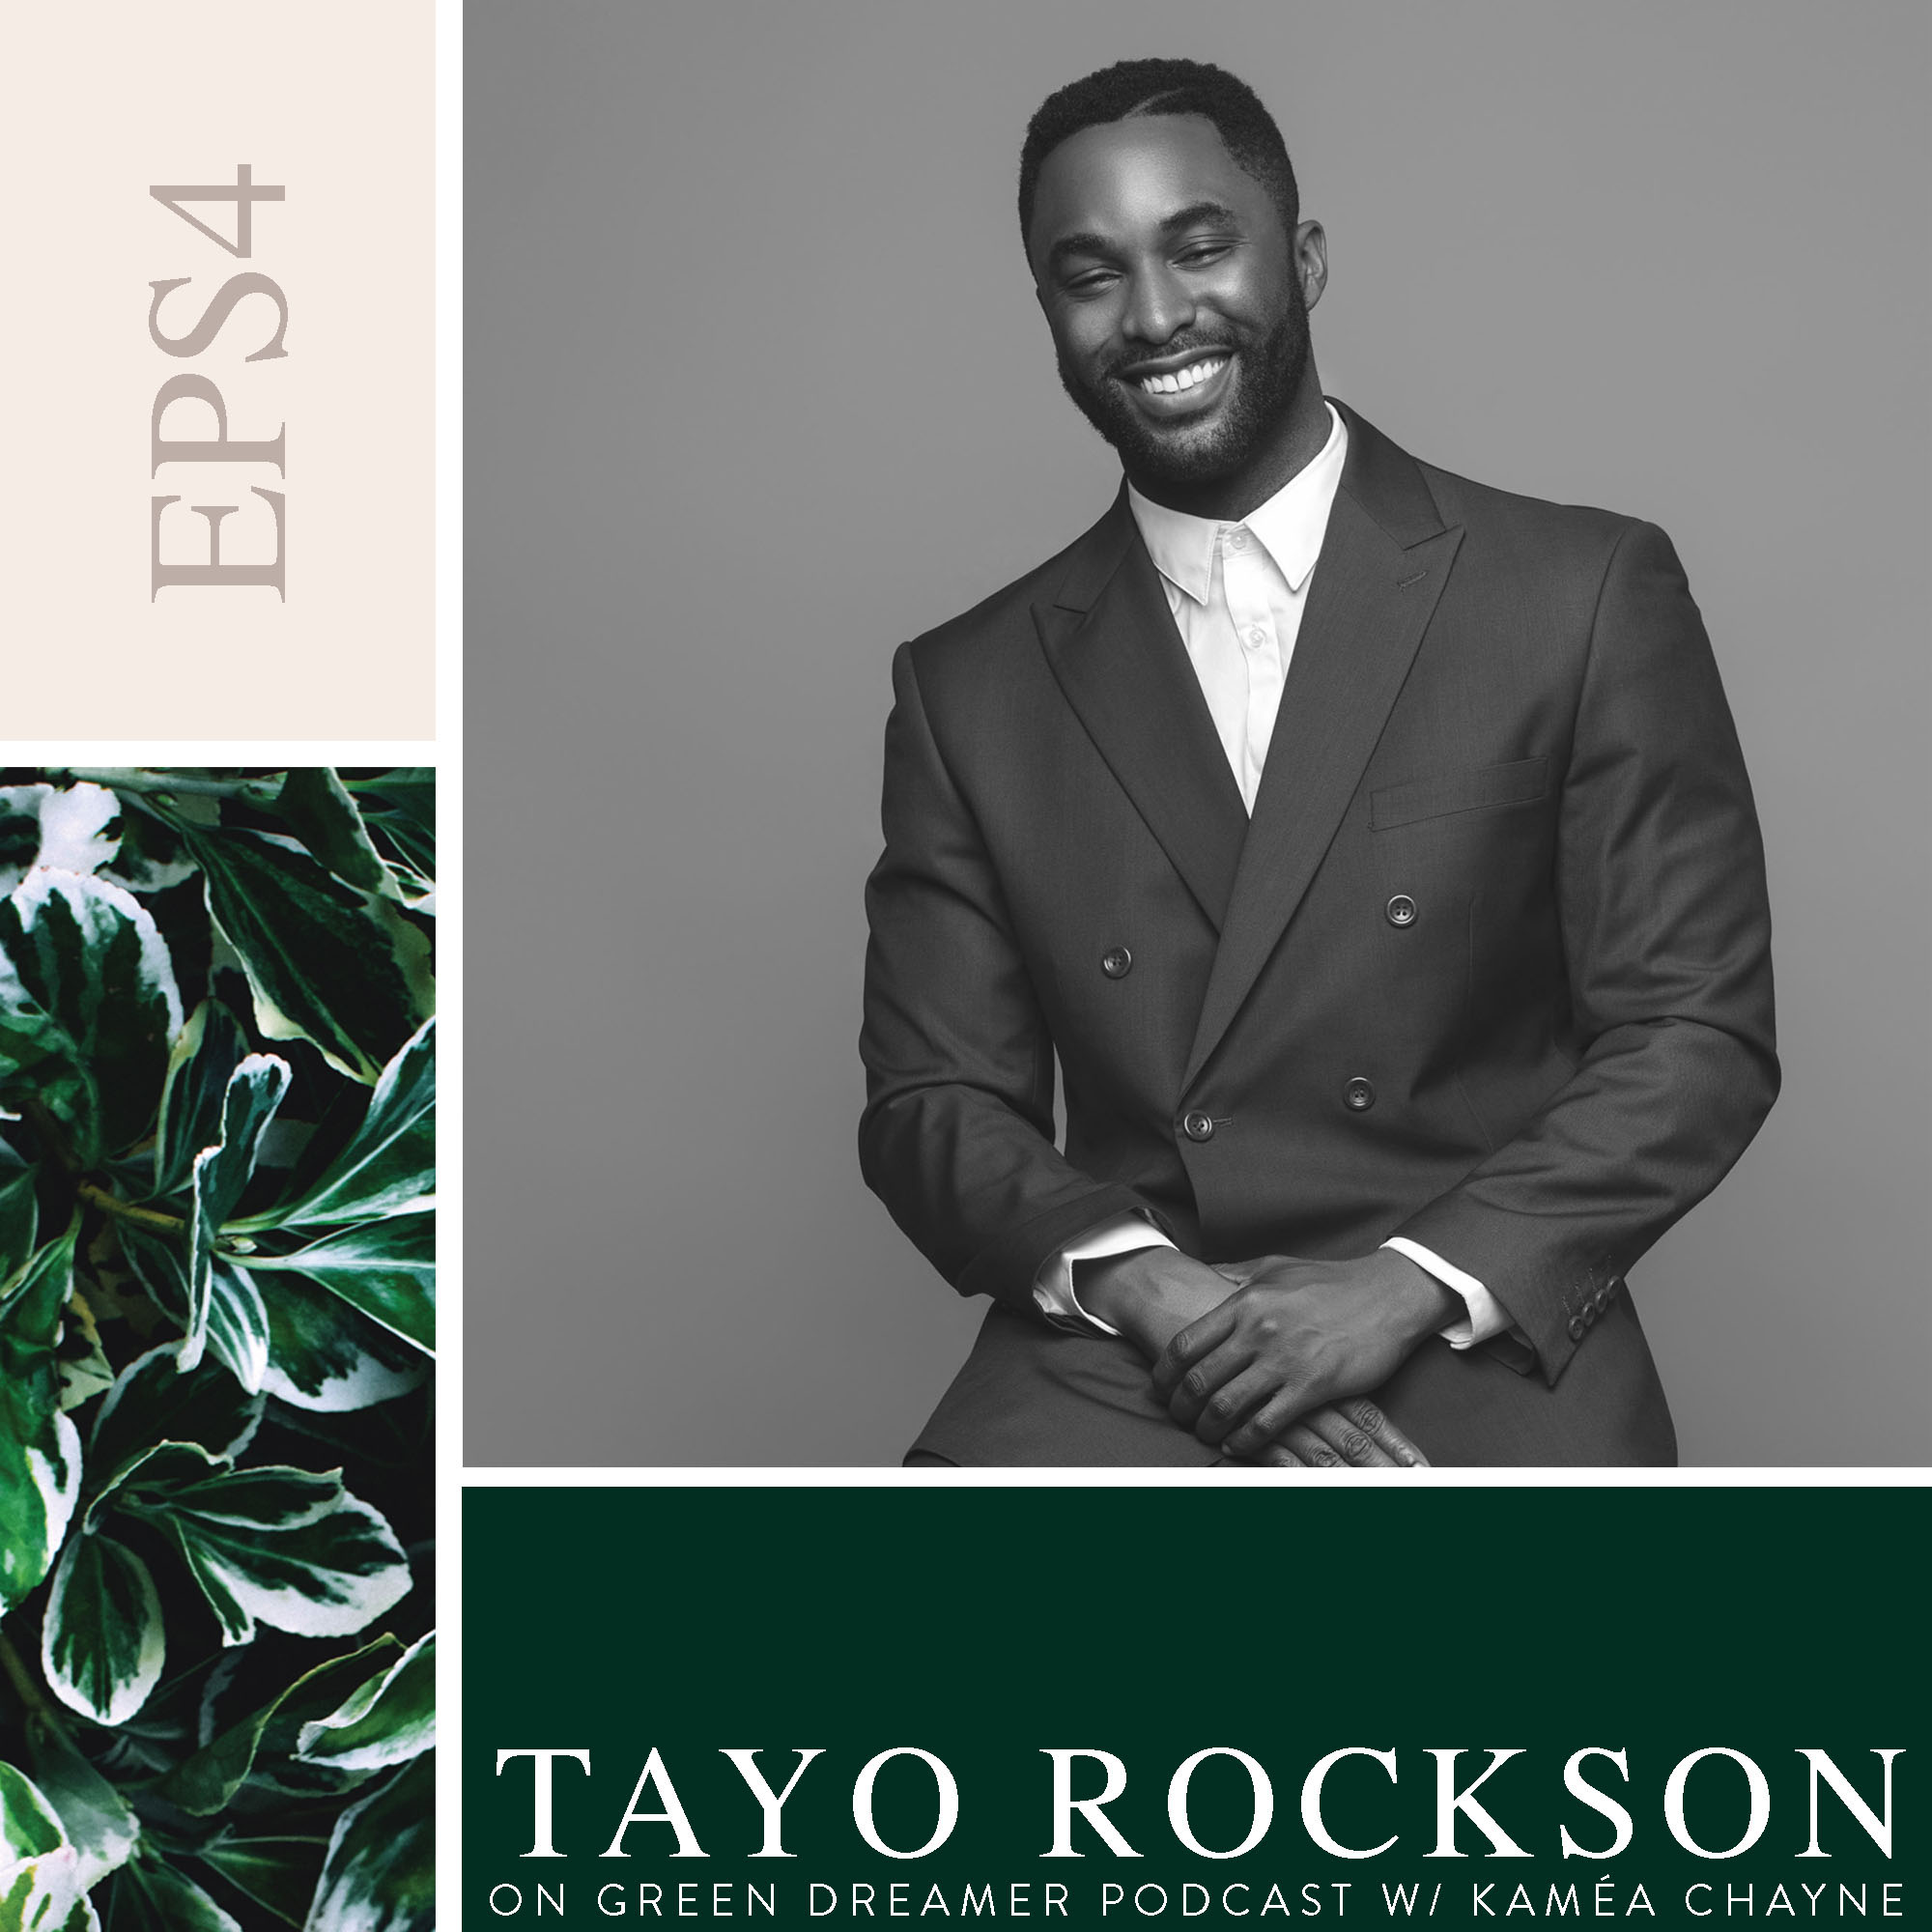 Tayo Rockson talks Sustainability on Green Dreamer Podcast with Kaméa Chayne